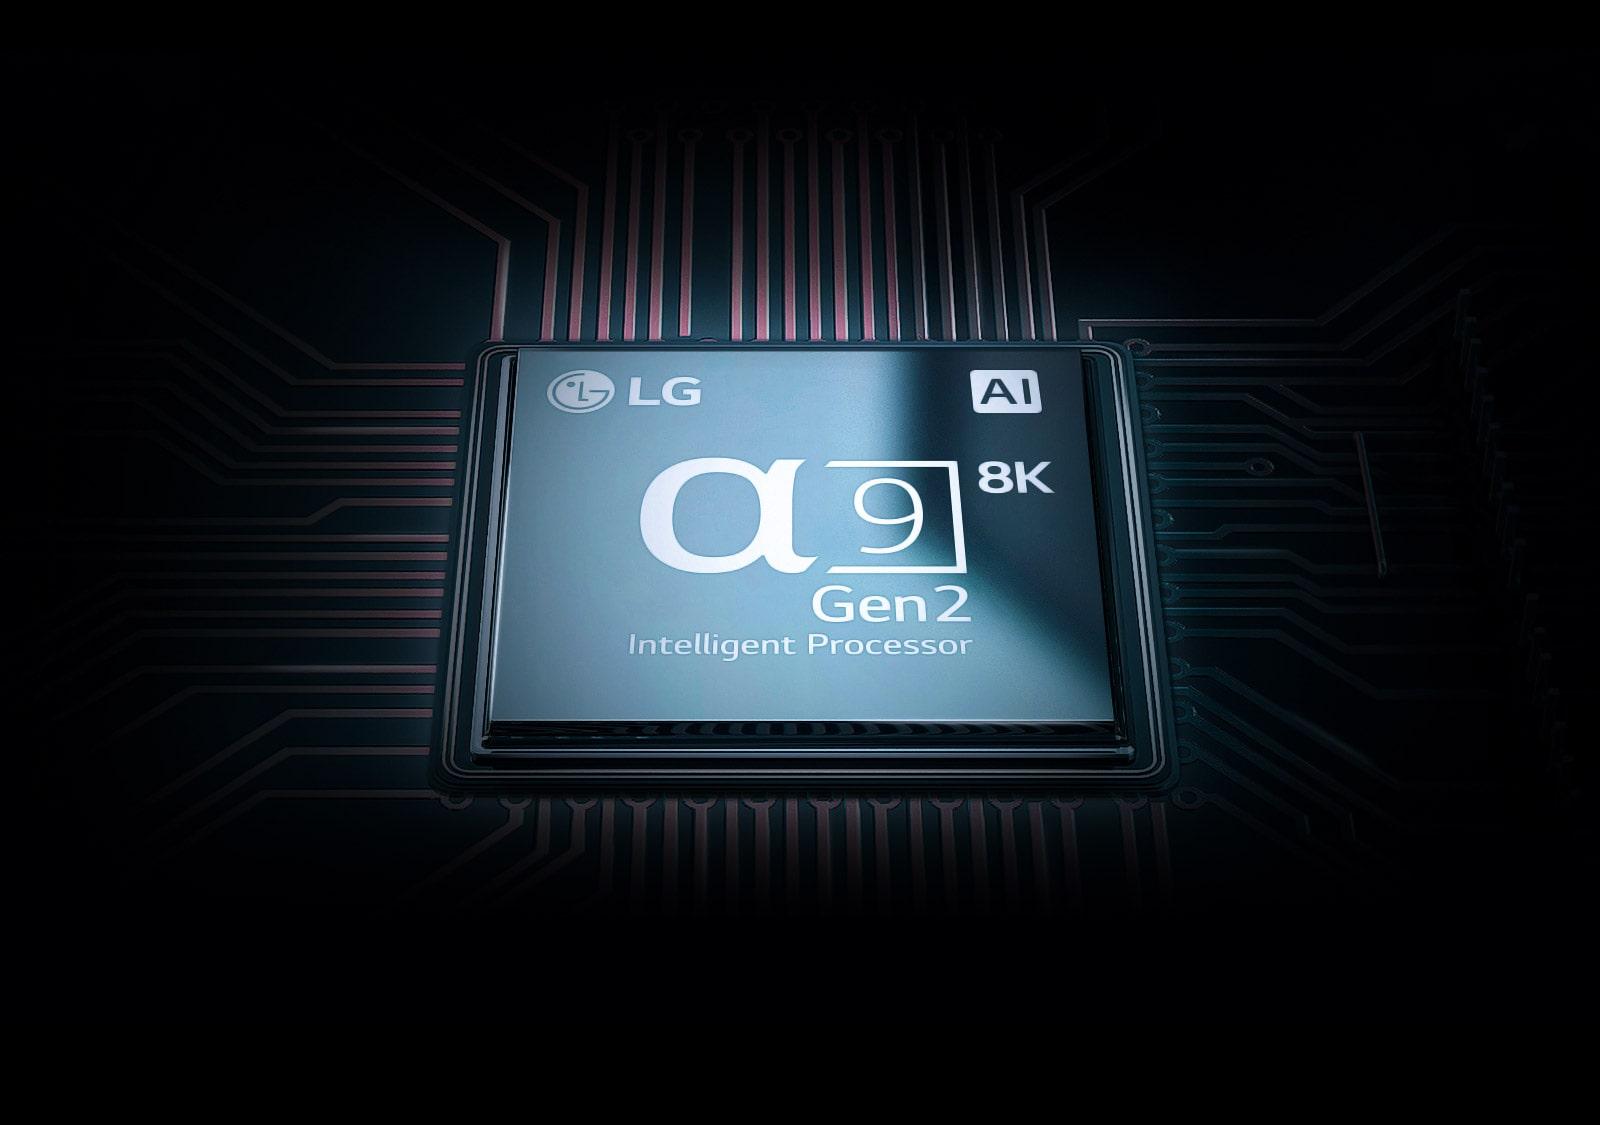 Image of alpha 9 Gen 2 processor of LG SIGNATURE OELD TV Z9